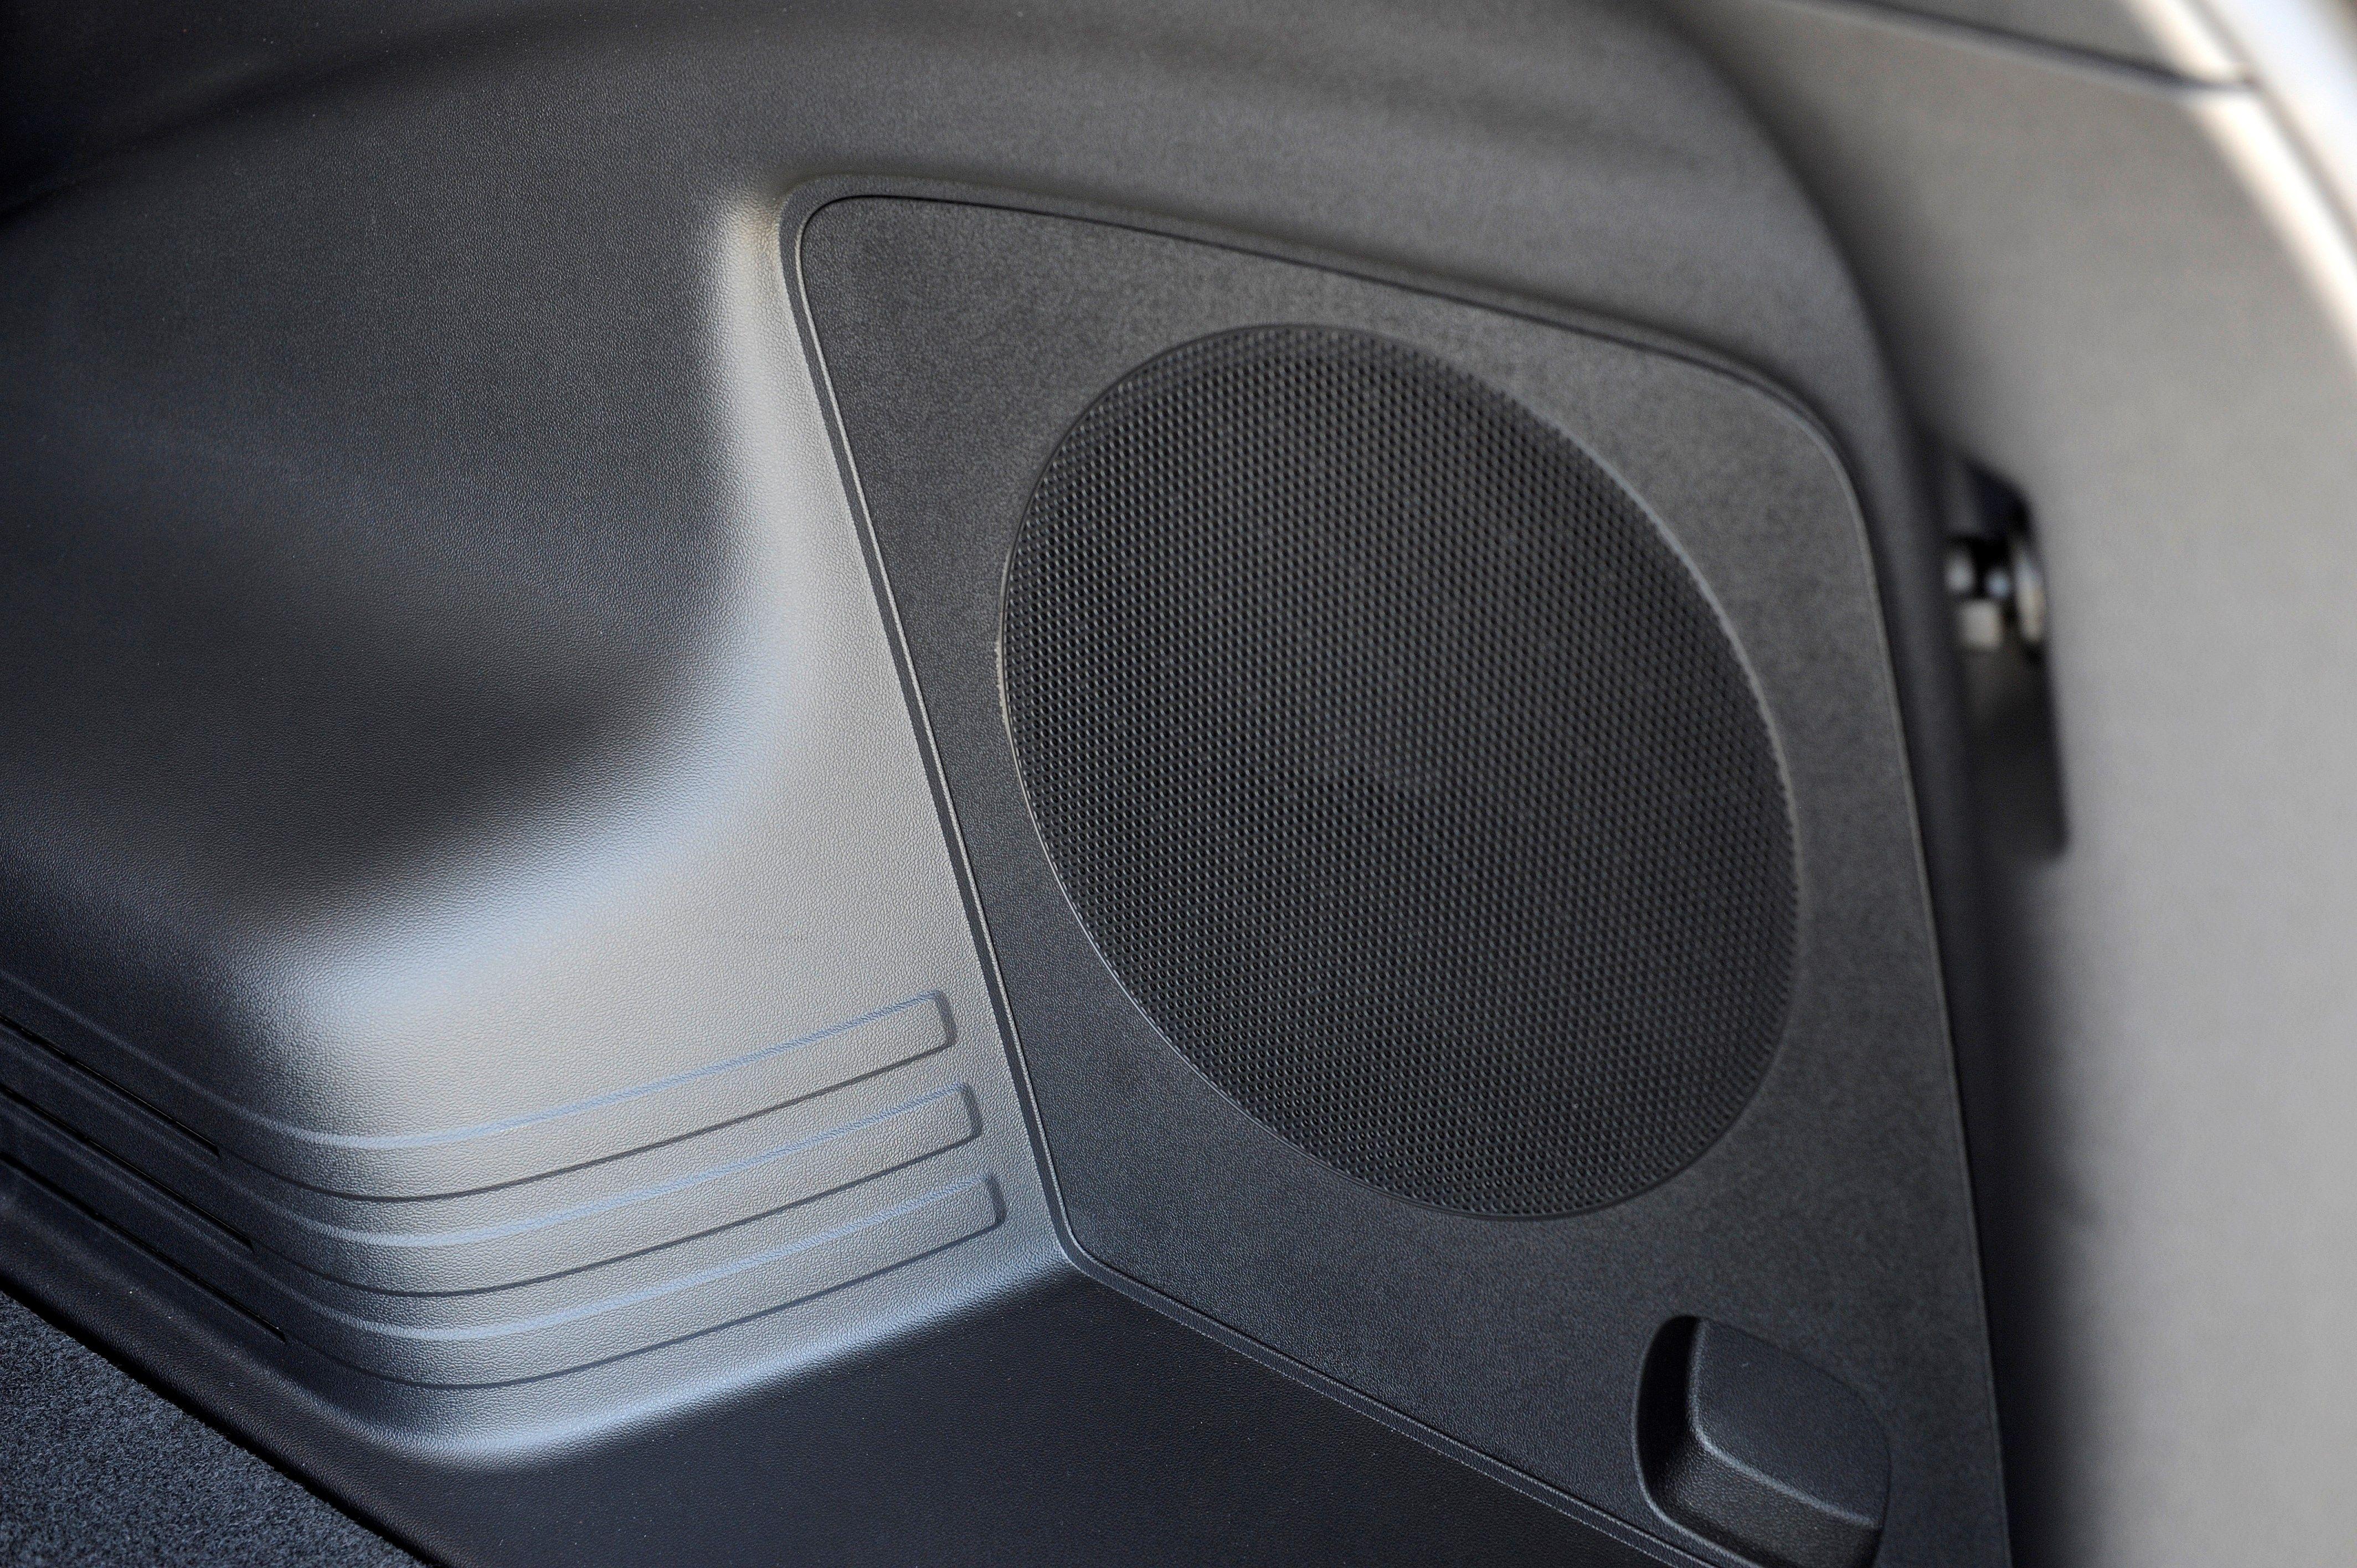 2014 Tucson 360 Watt Premium Audio System With External